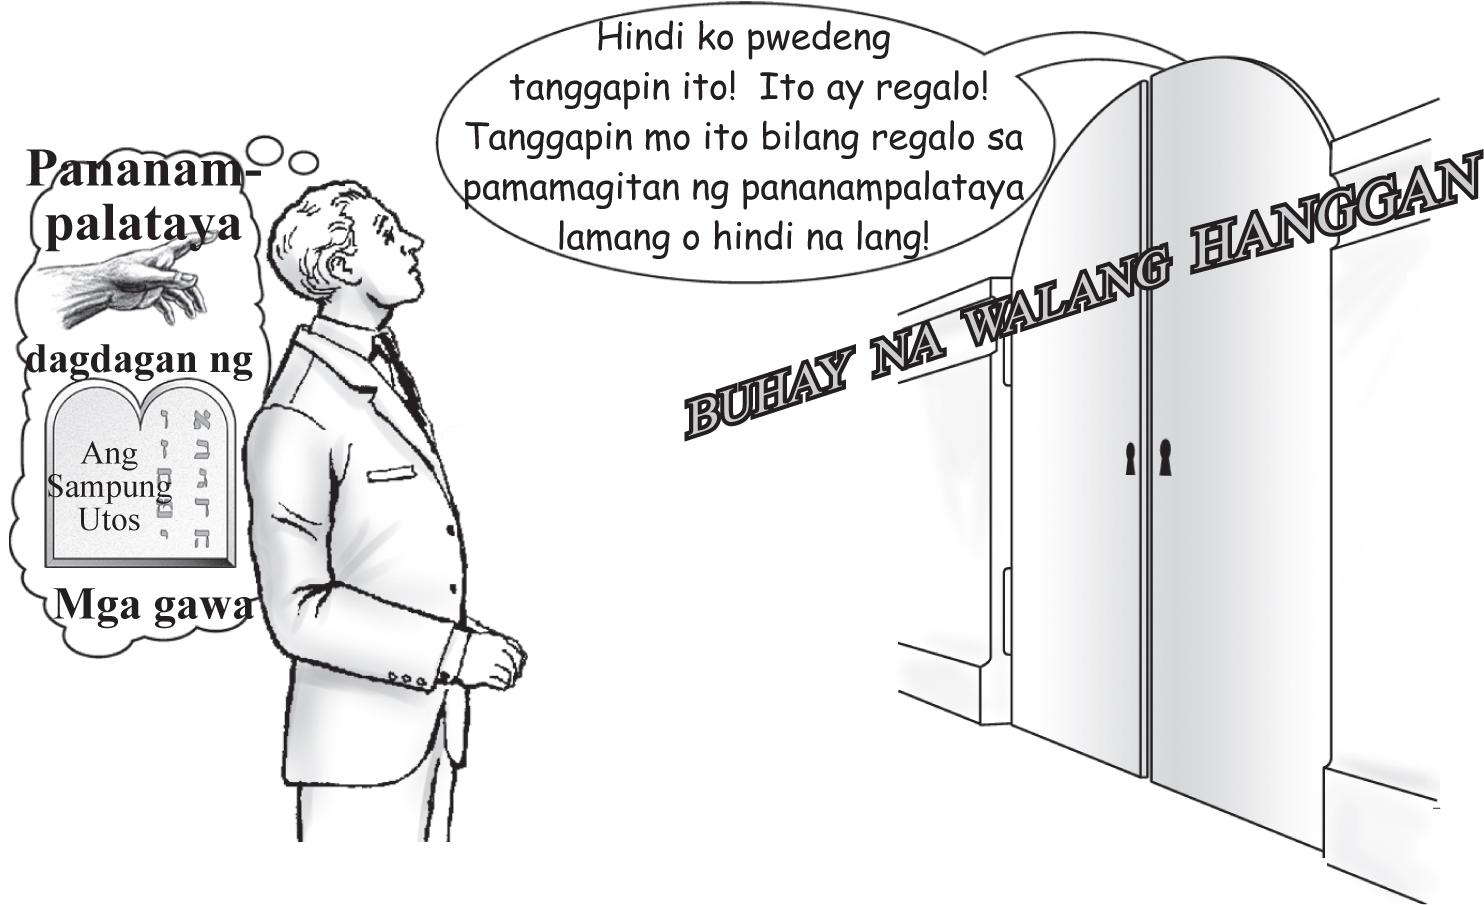 Gospel_Tagalog_p_15_Grace